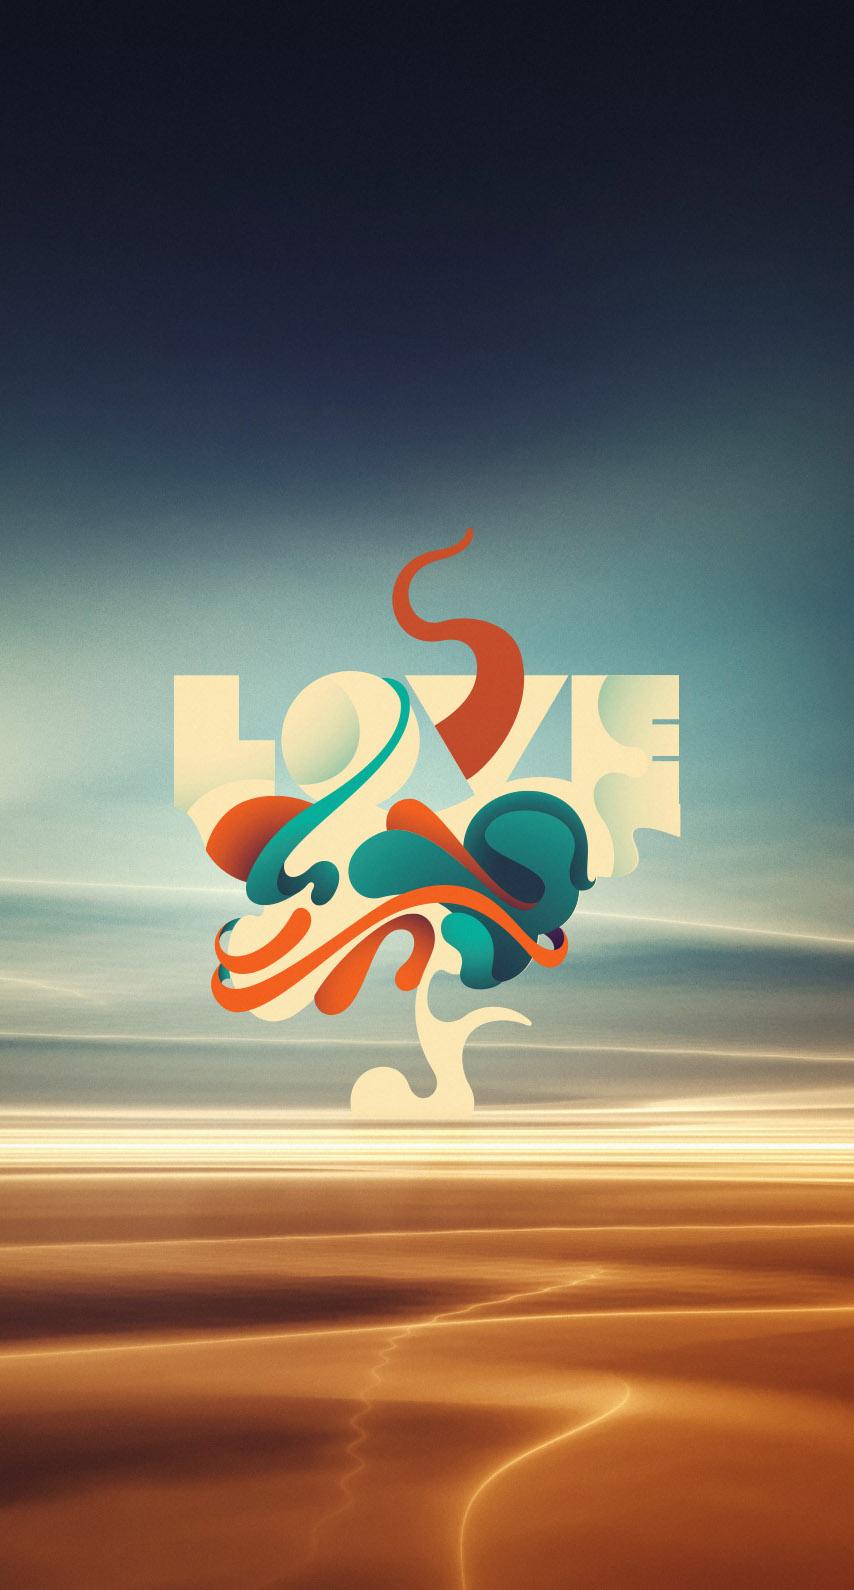 art, summer, sand, sun, desktop, hot, dawn, fair weather, outdoors, horizon, seashore